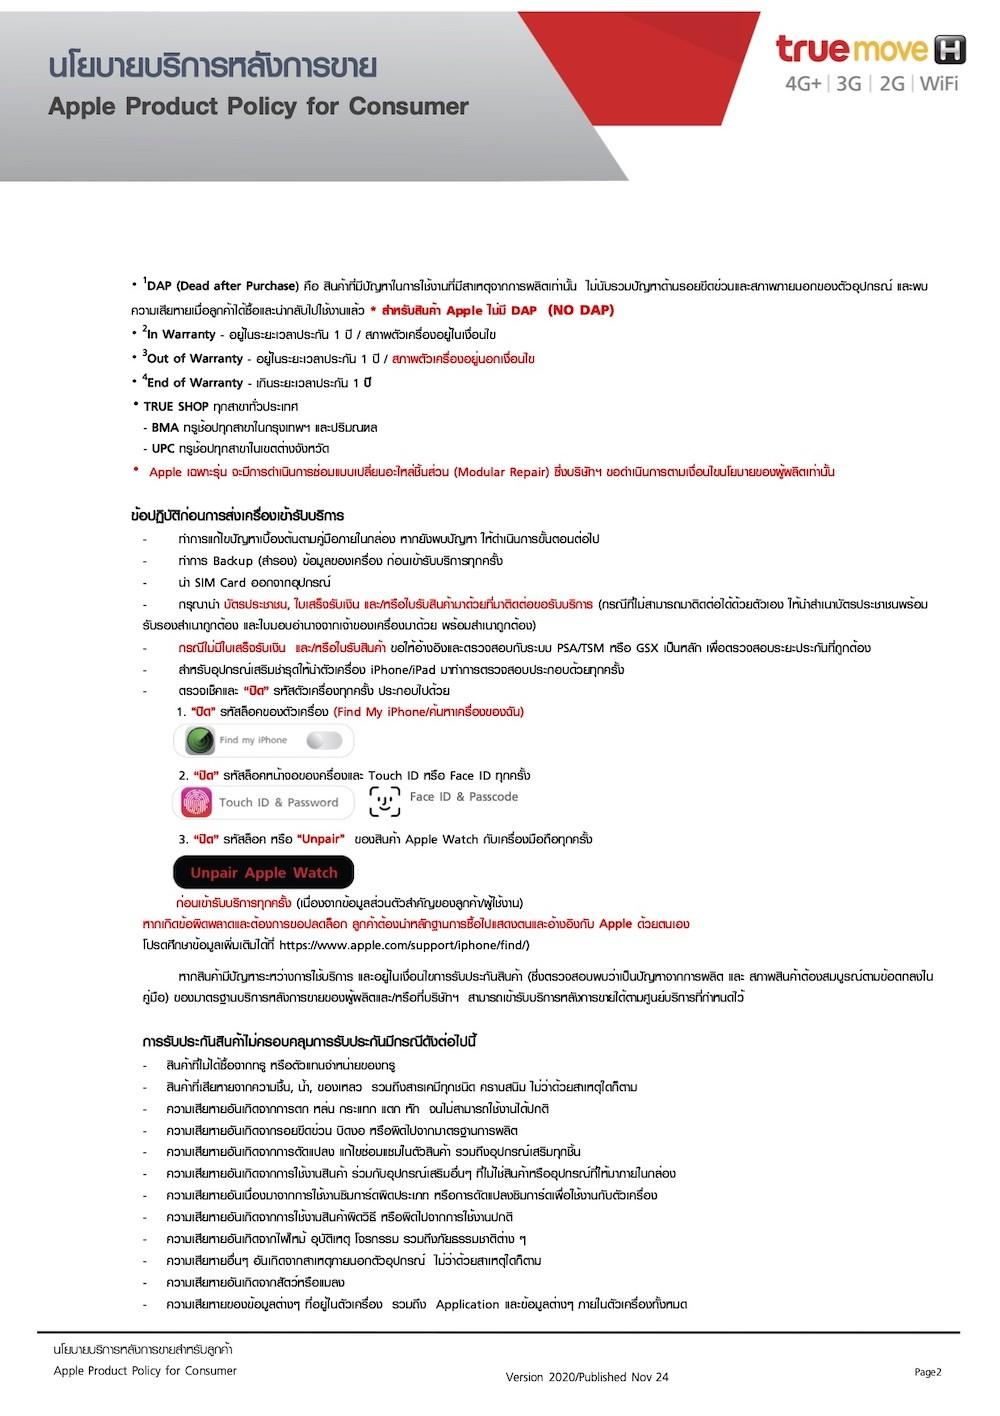 2-dafs_policy_consumer_apple_nov242020.j